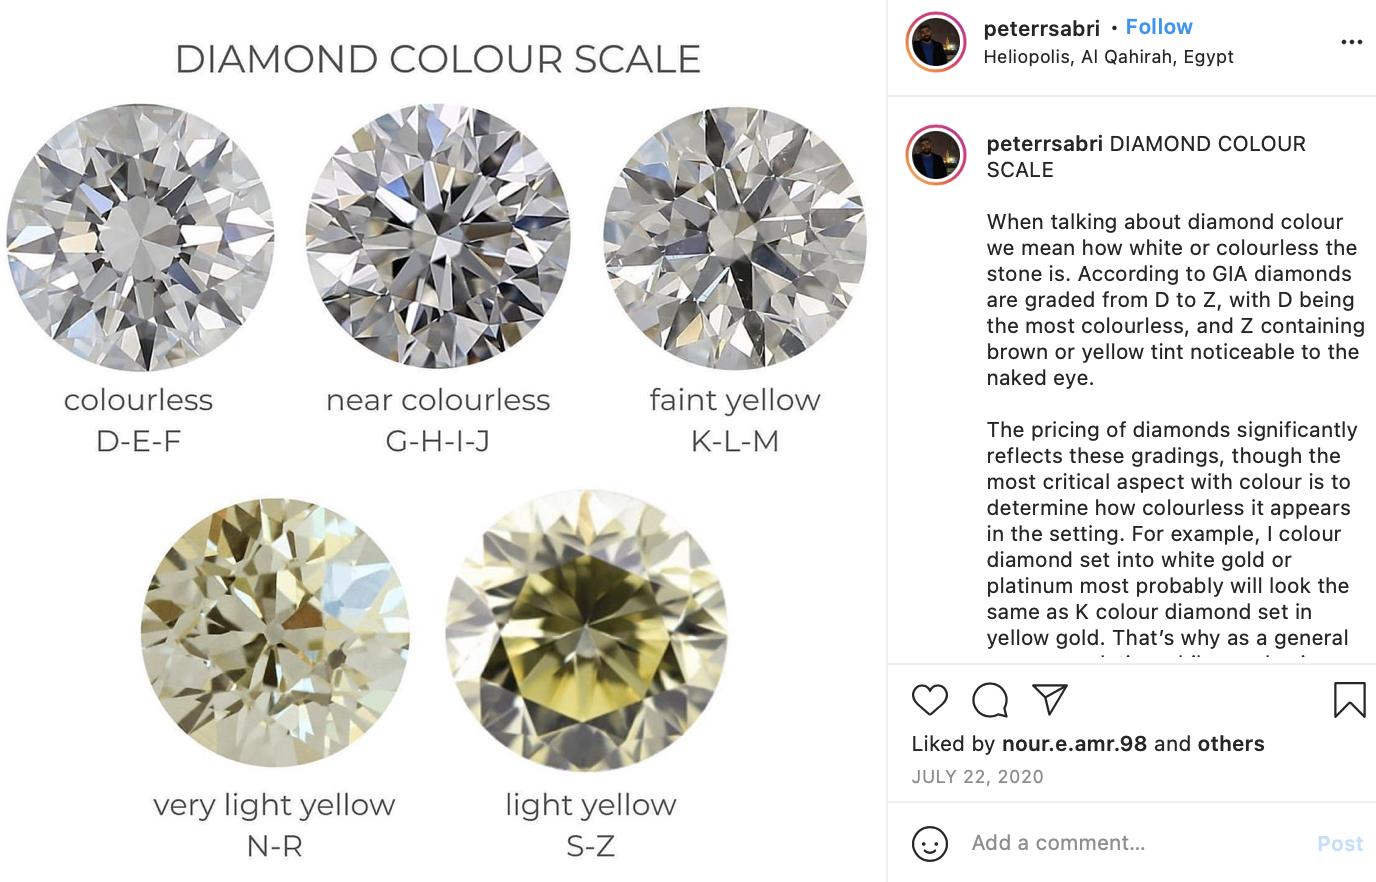 Instagram post explaining the diamond color scale